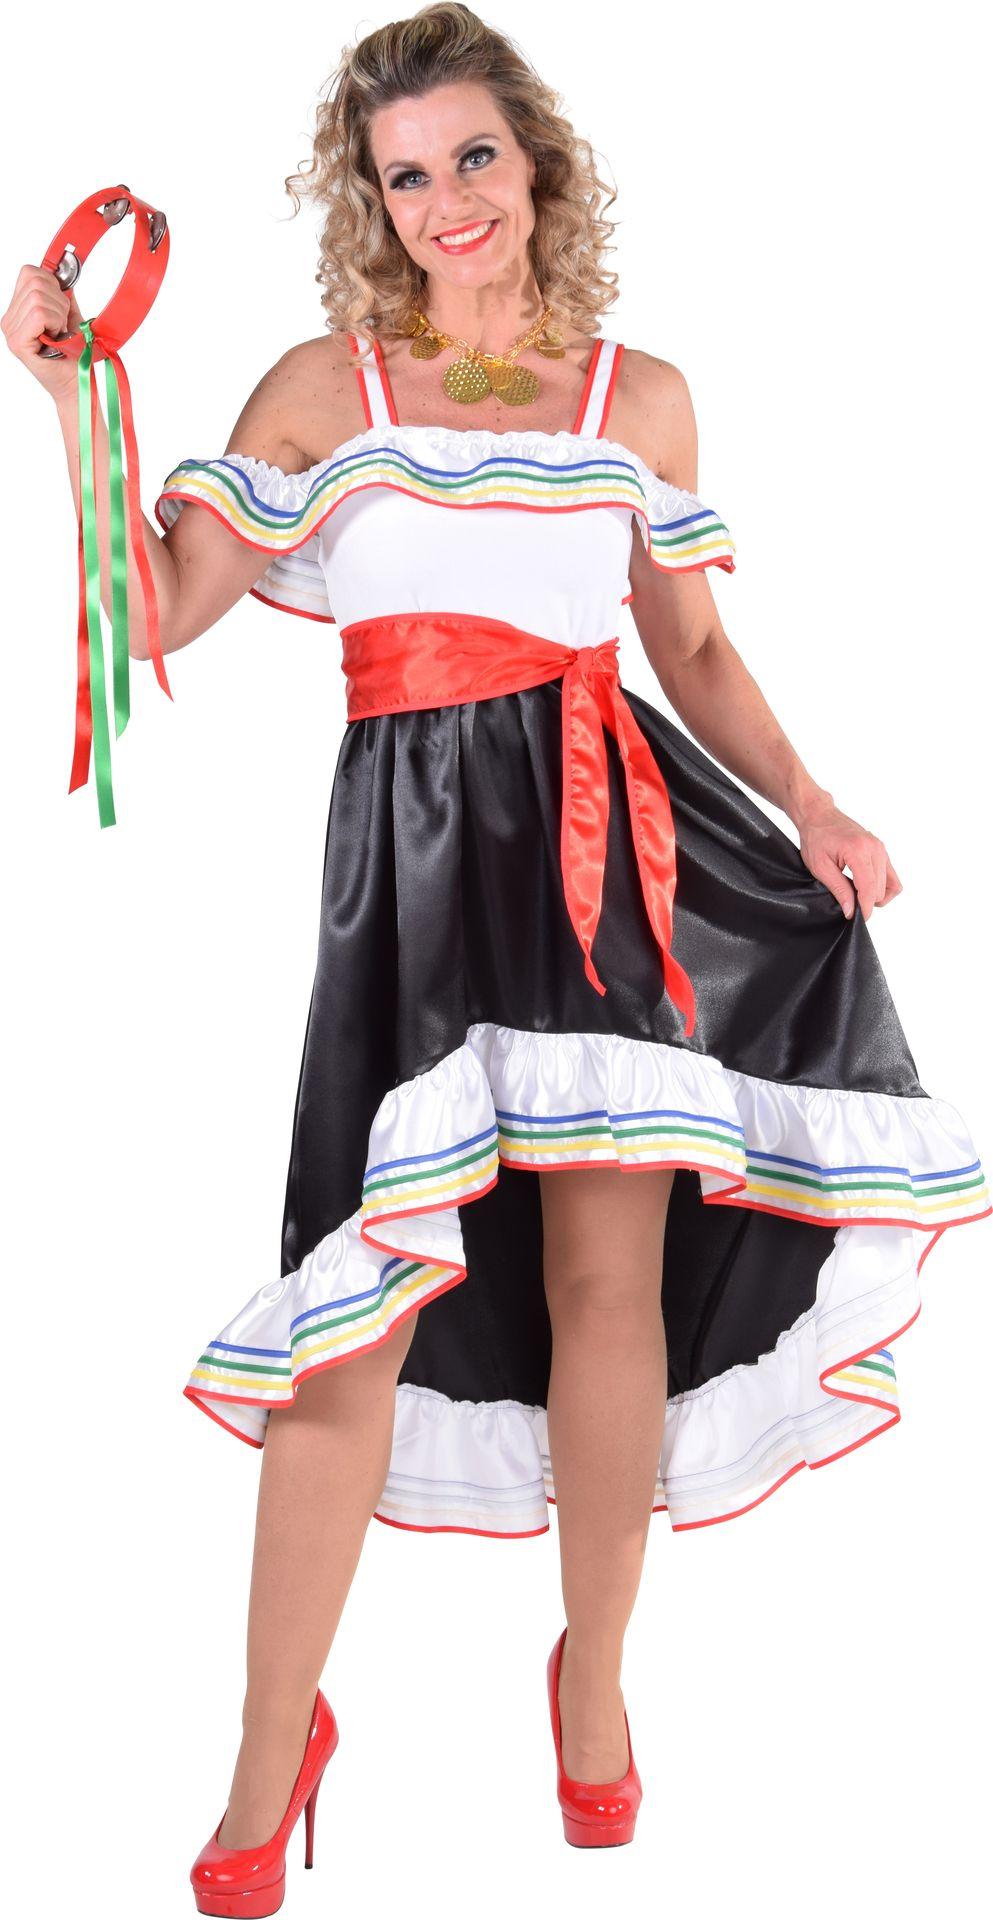 Hongaarse jurk dames